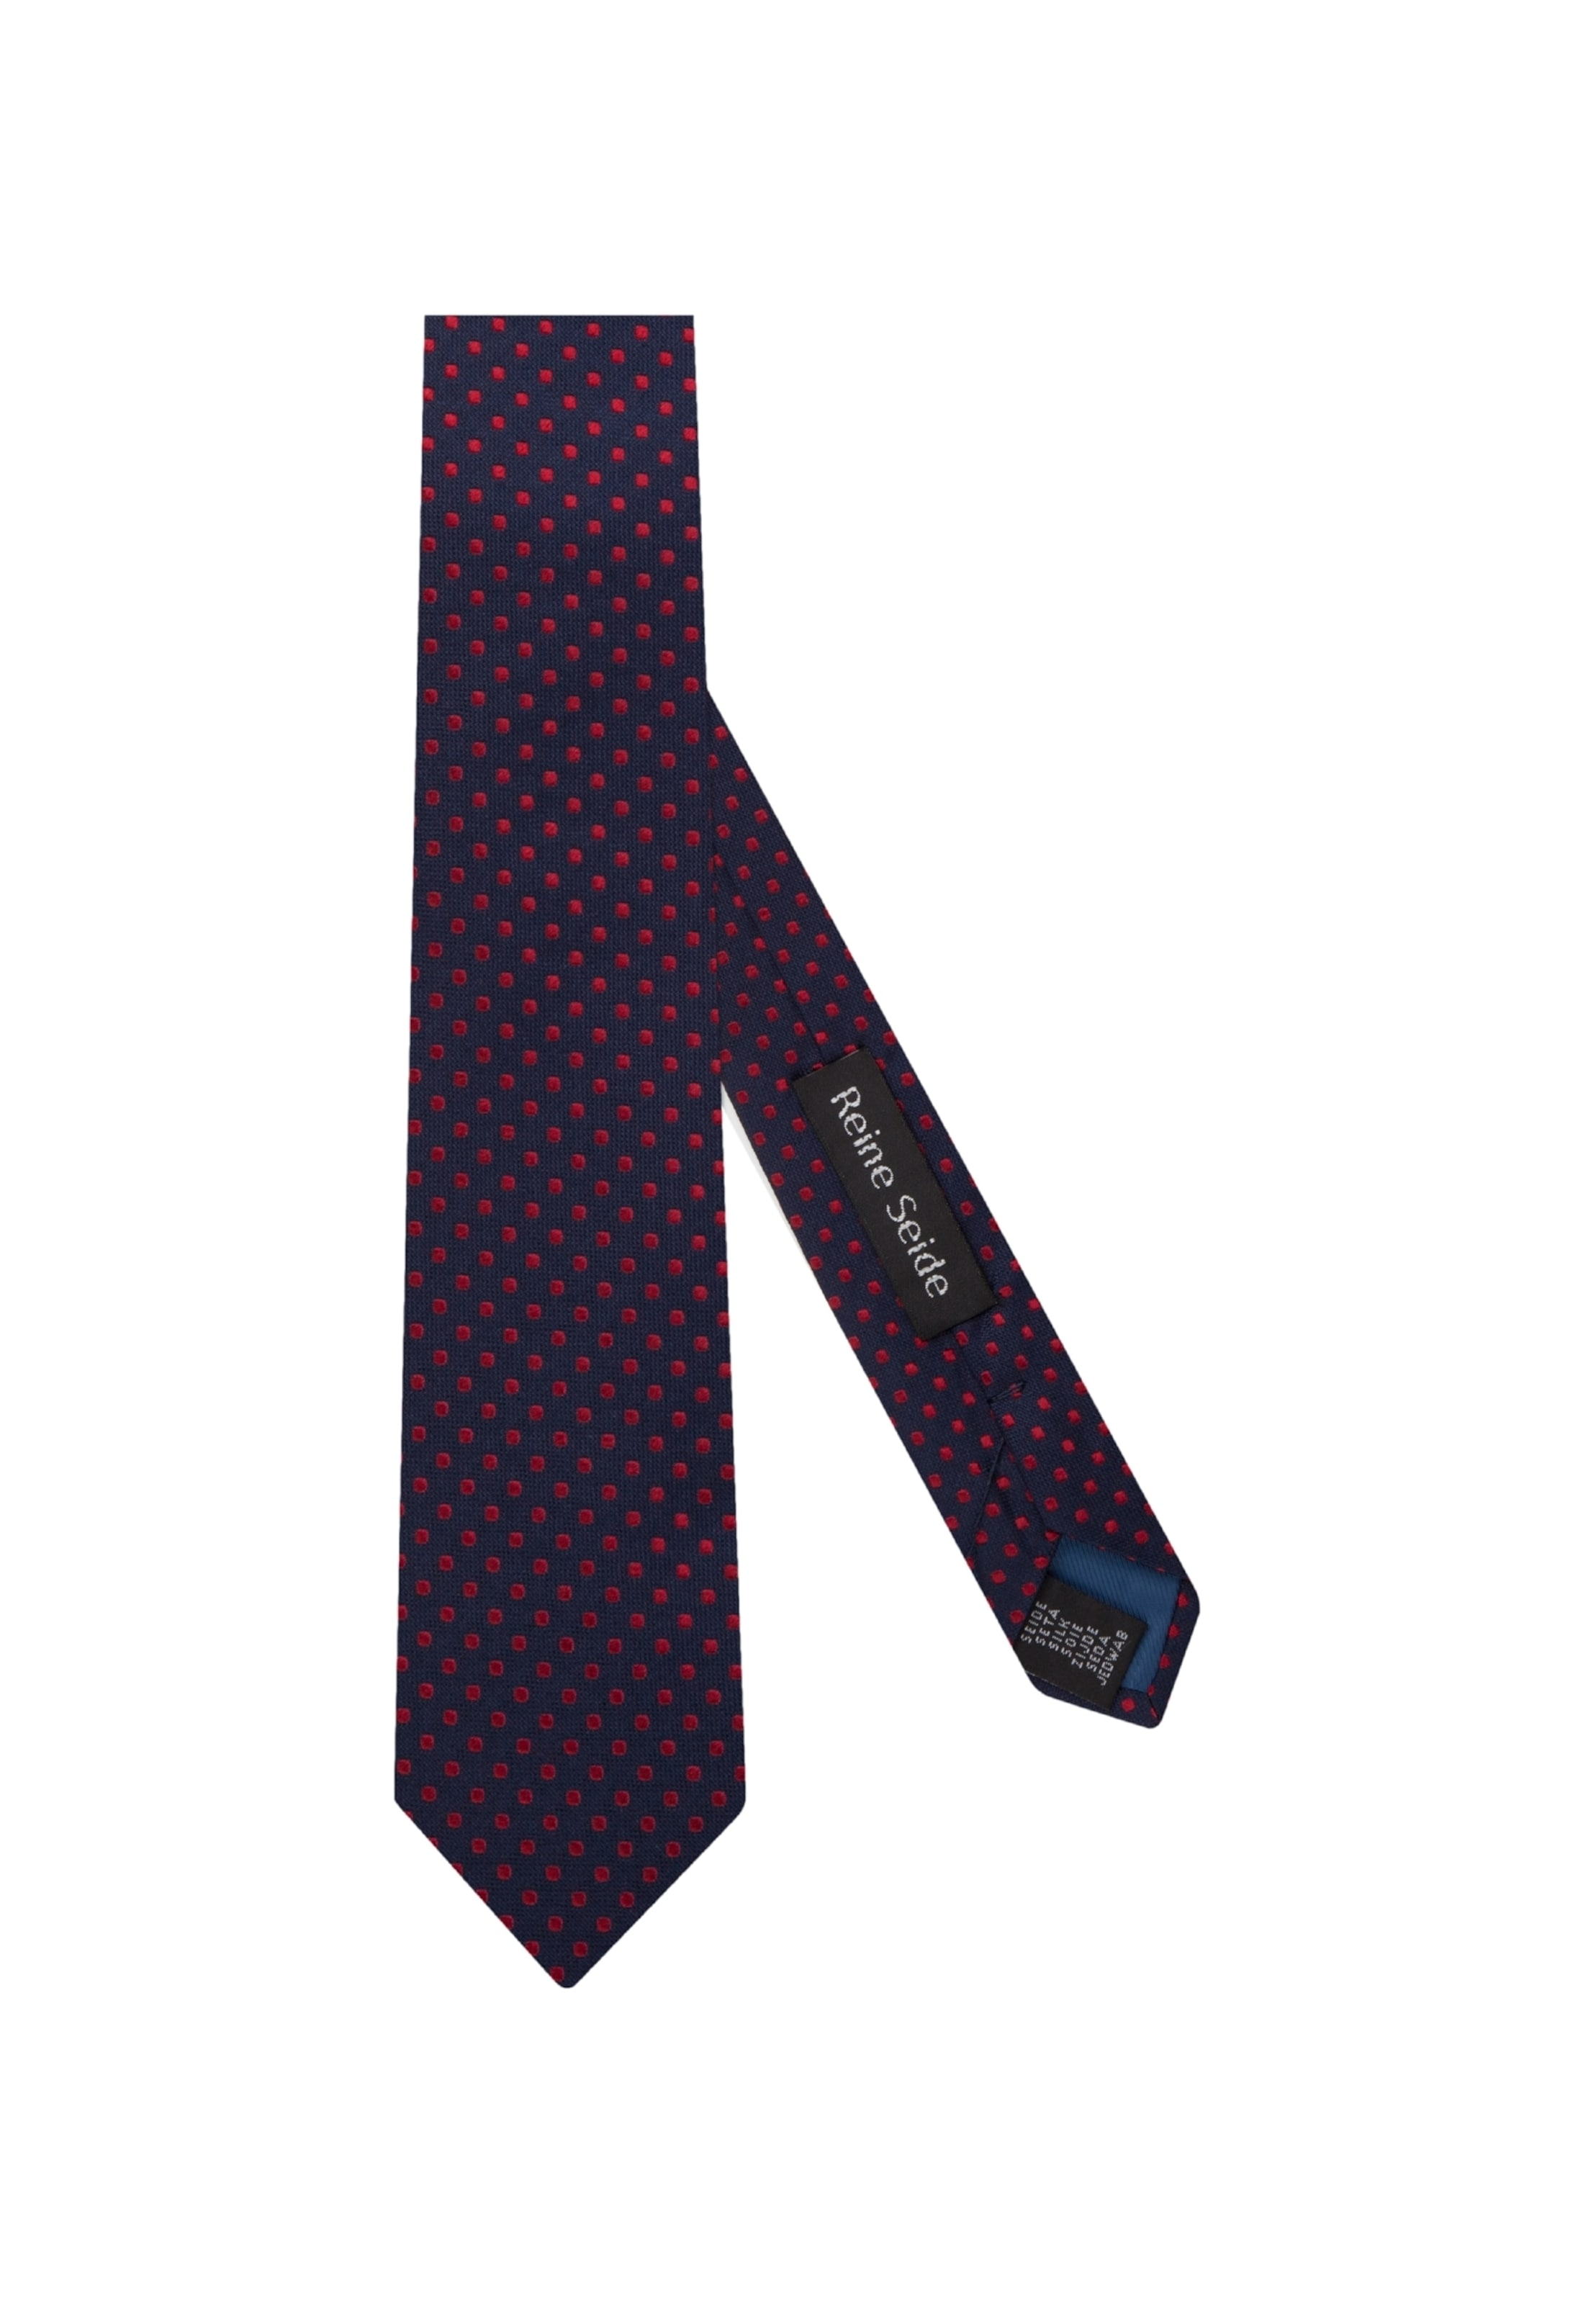 Krawatte Rose ' In Schwarze Seidensticker Blau qSUVzMp